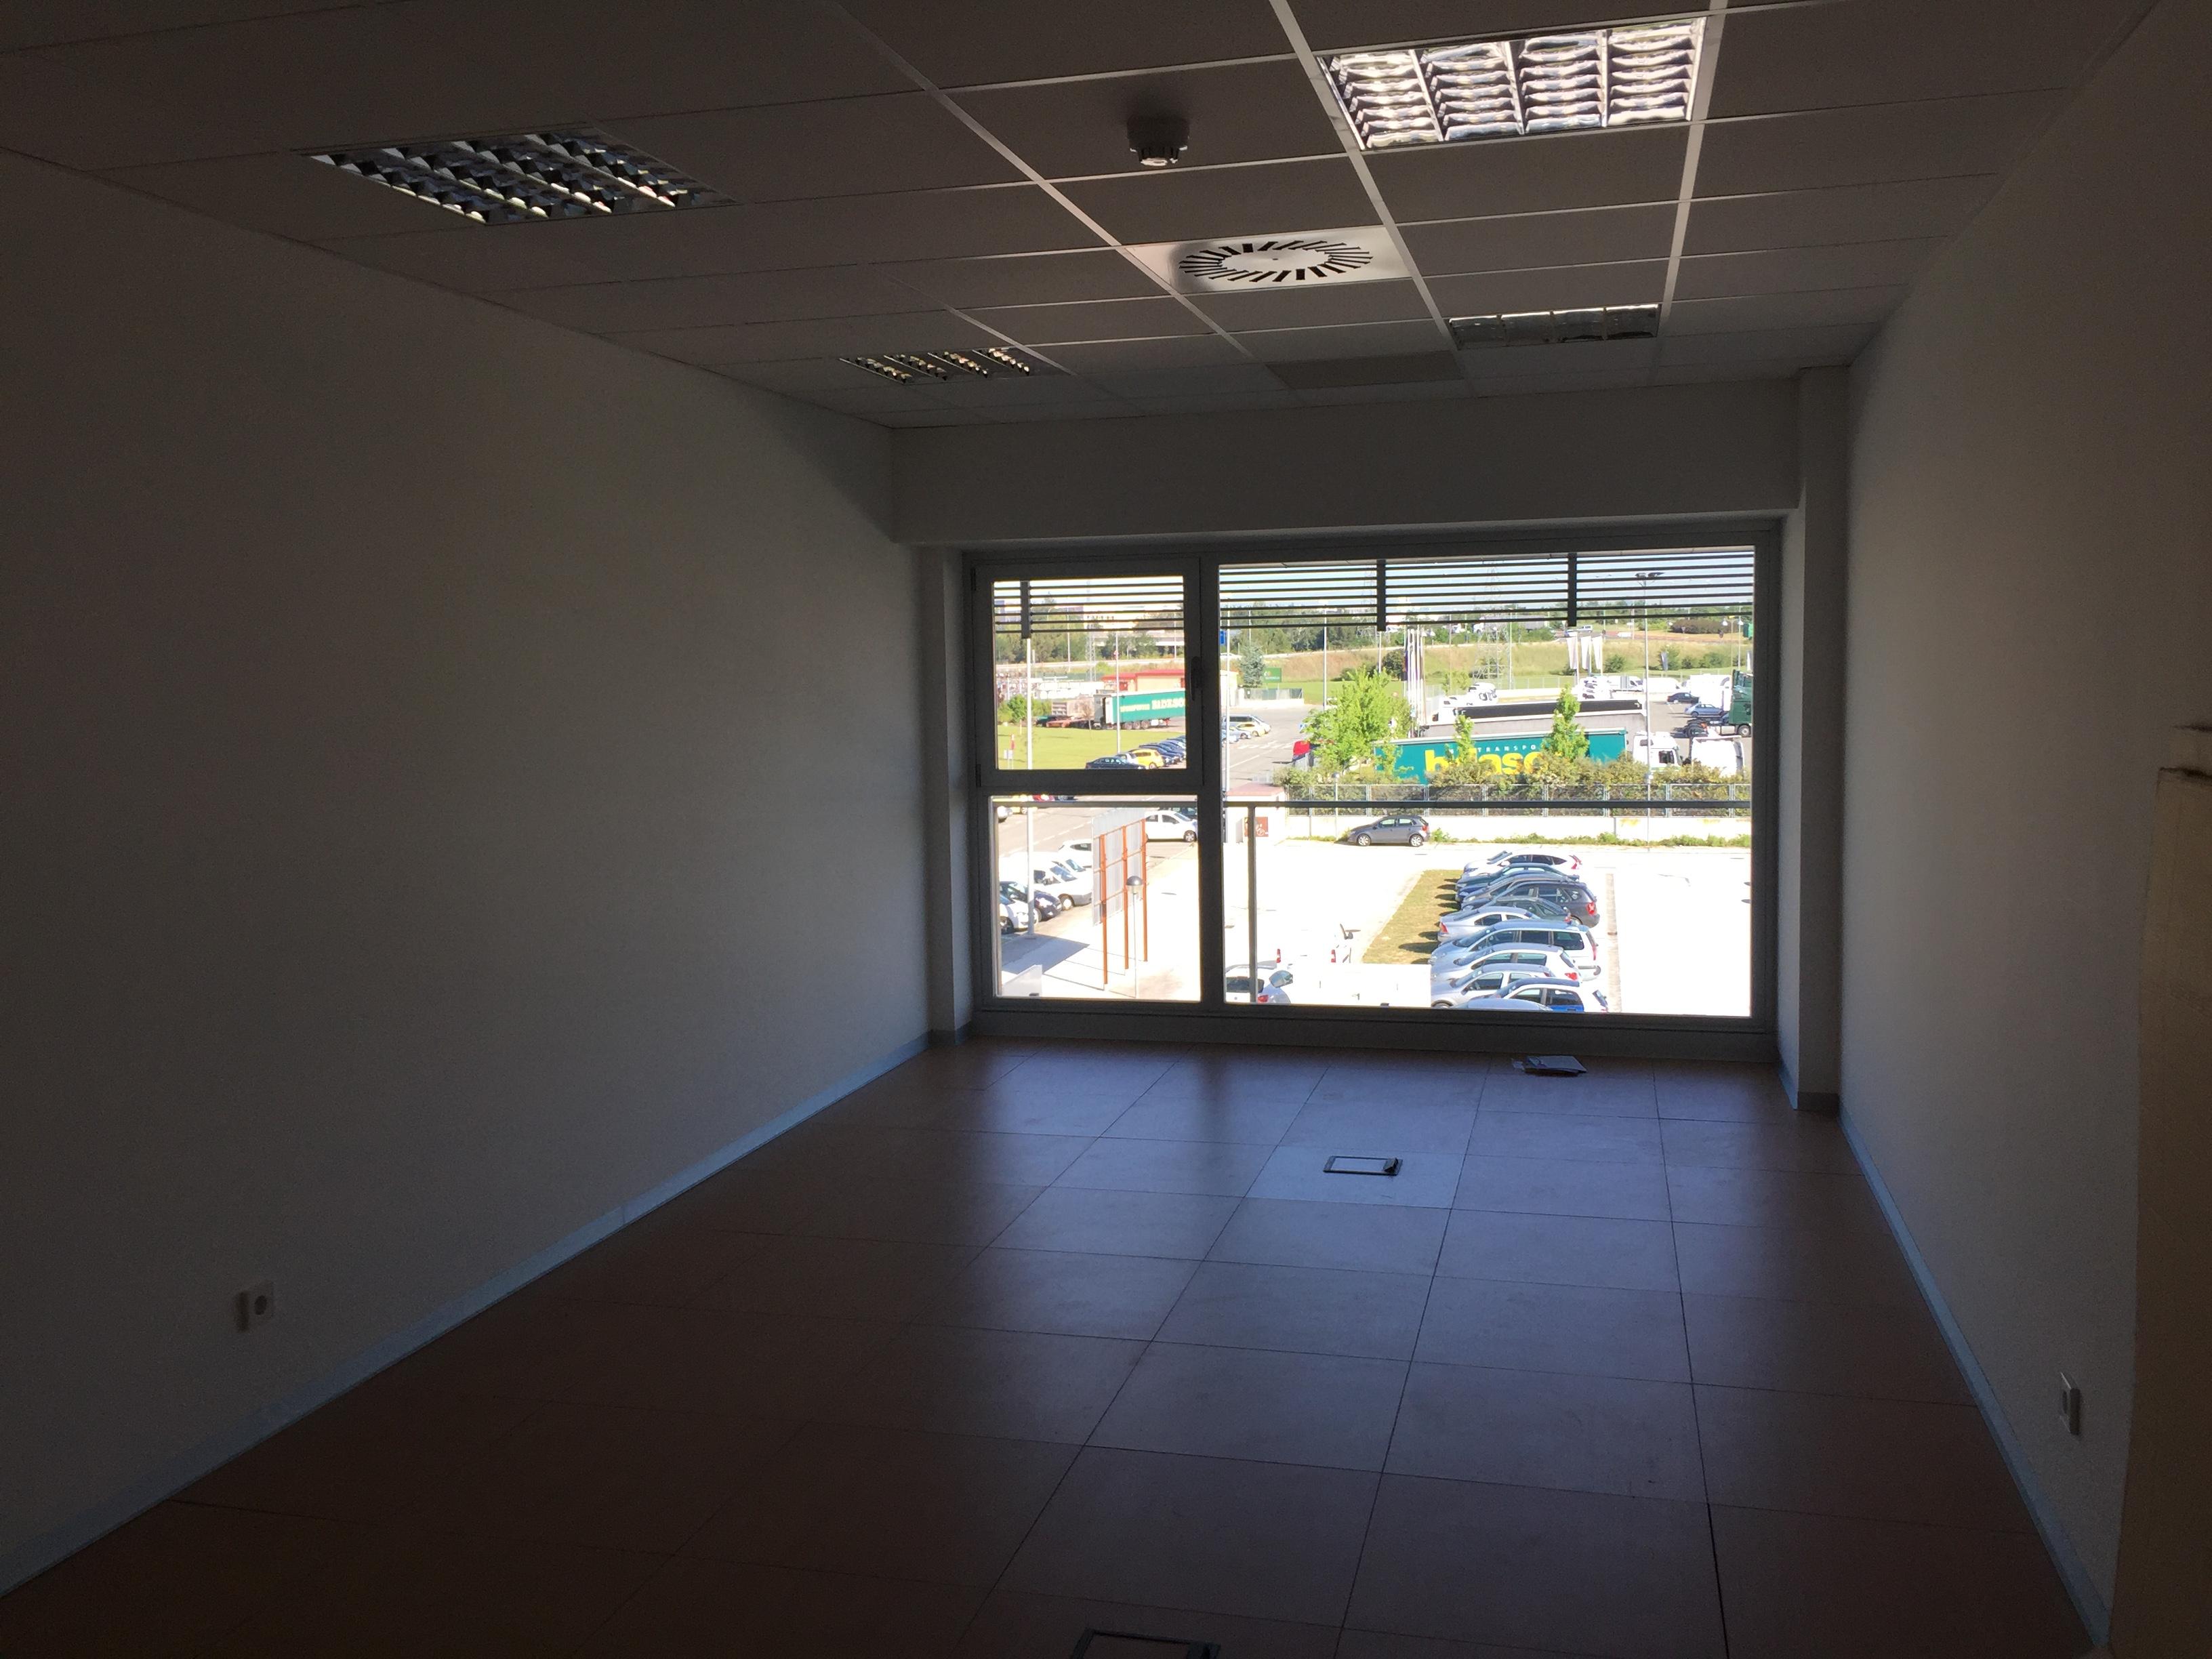 Venta viviendas lezkairu promociones irabia pamplona for Pisos caja rural navarra